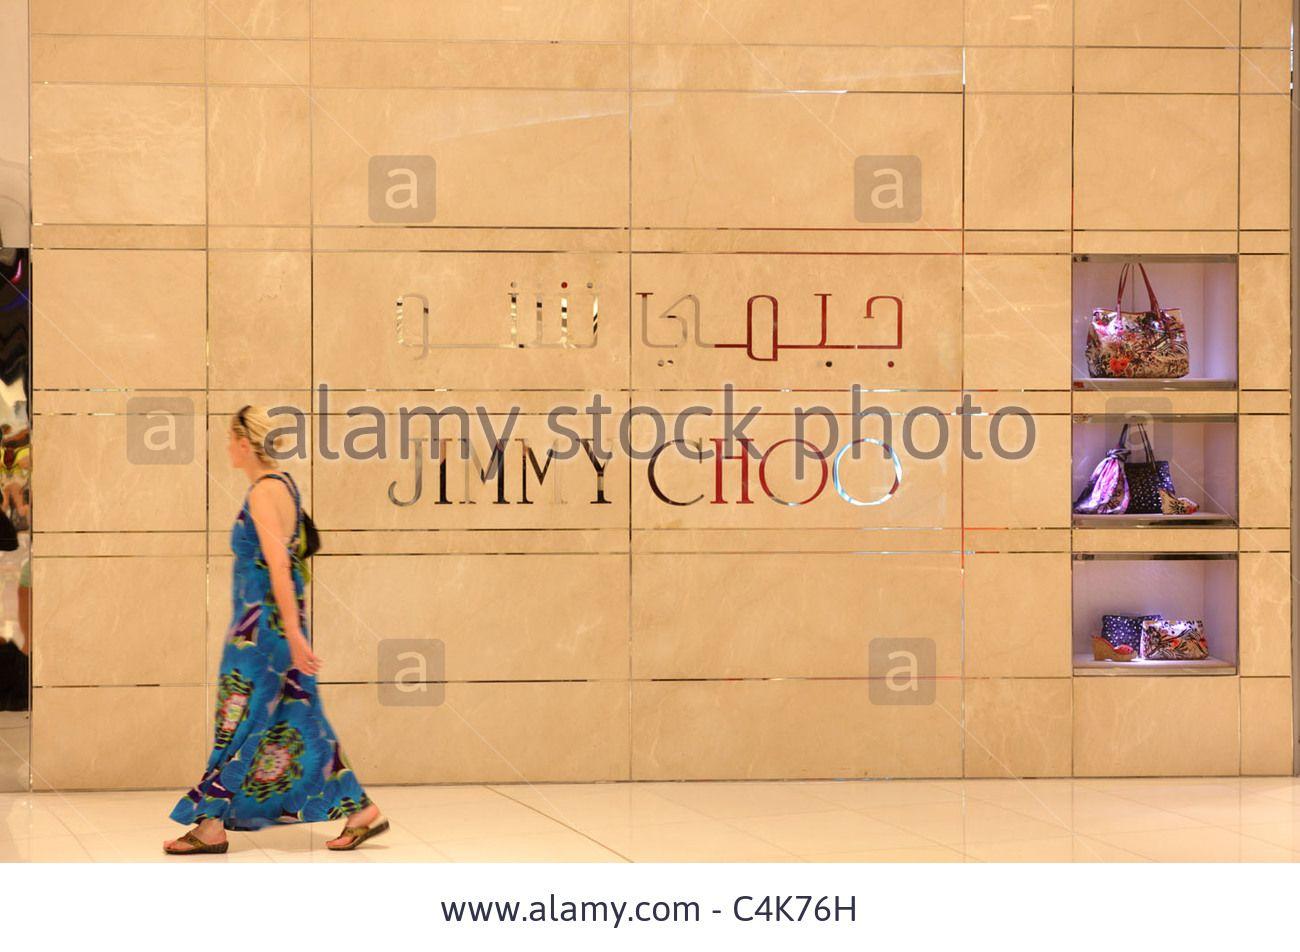 dfa01014bab Jimmy Choo showroom at Dubai Mall